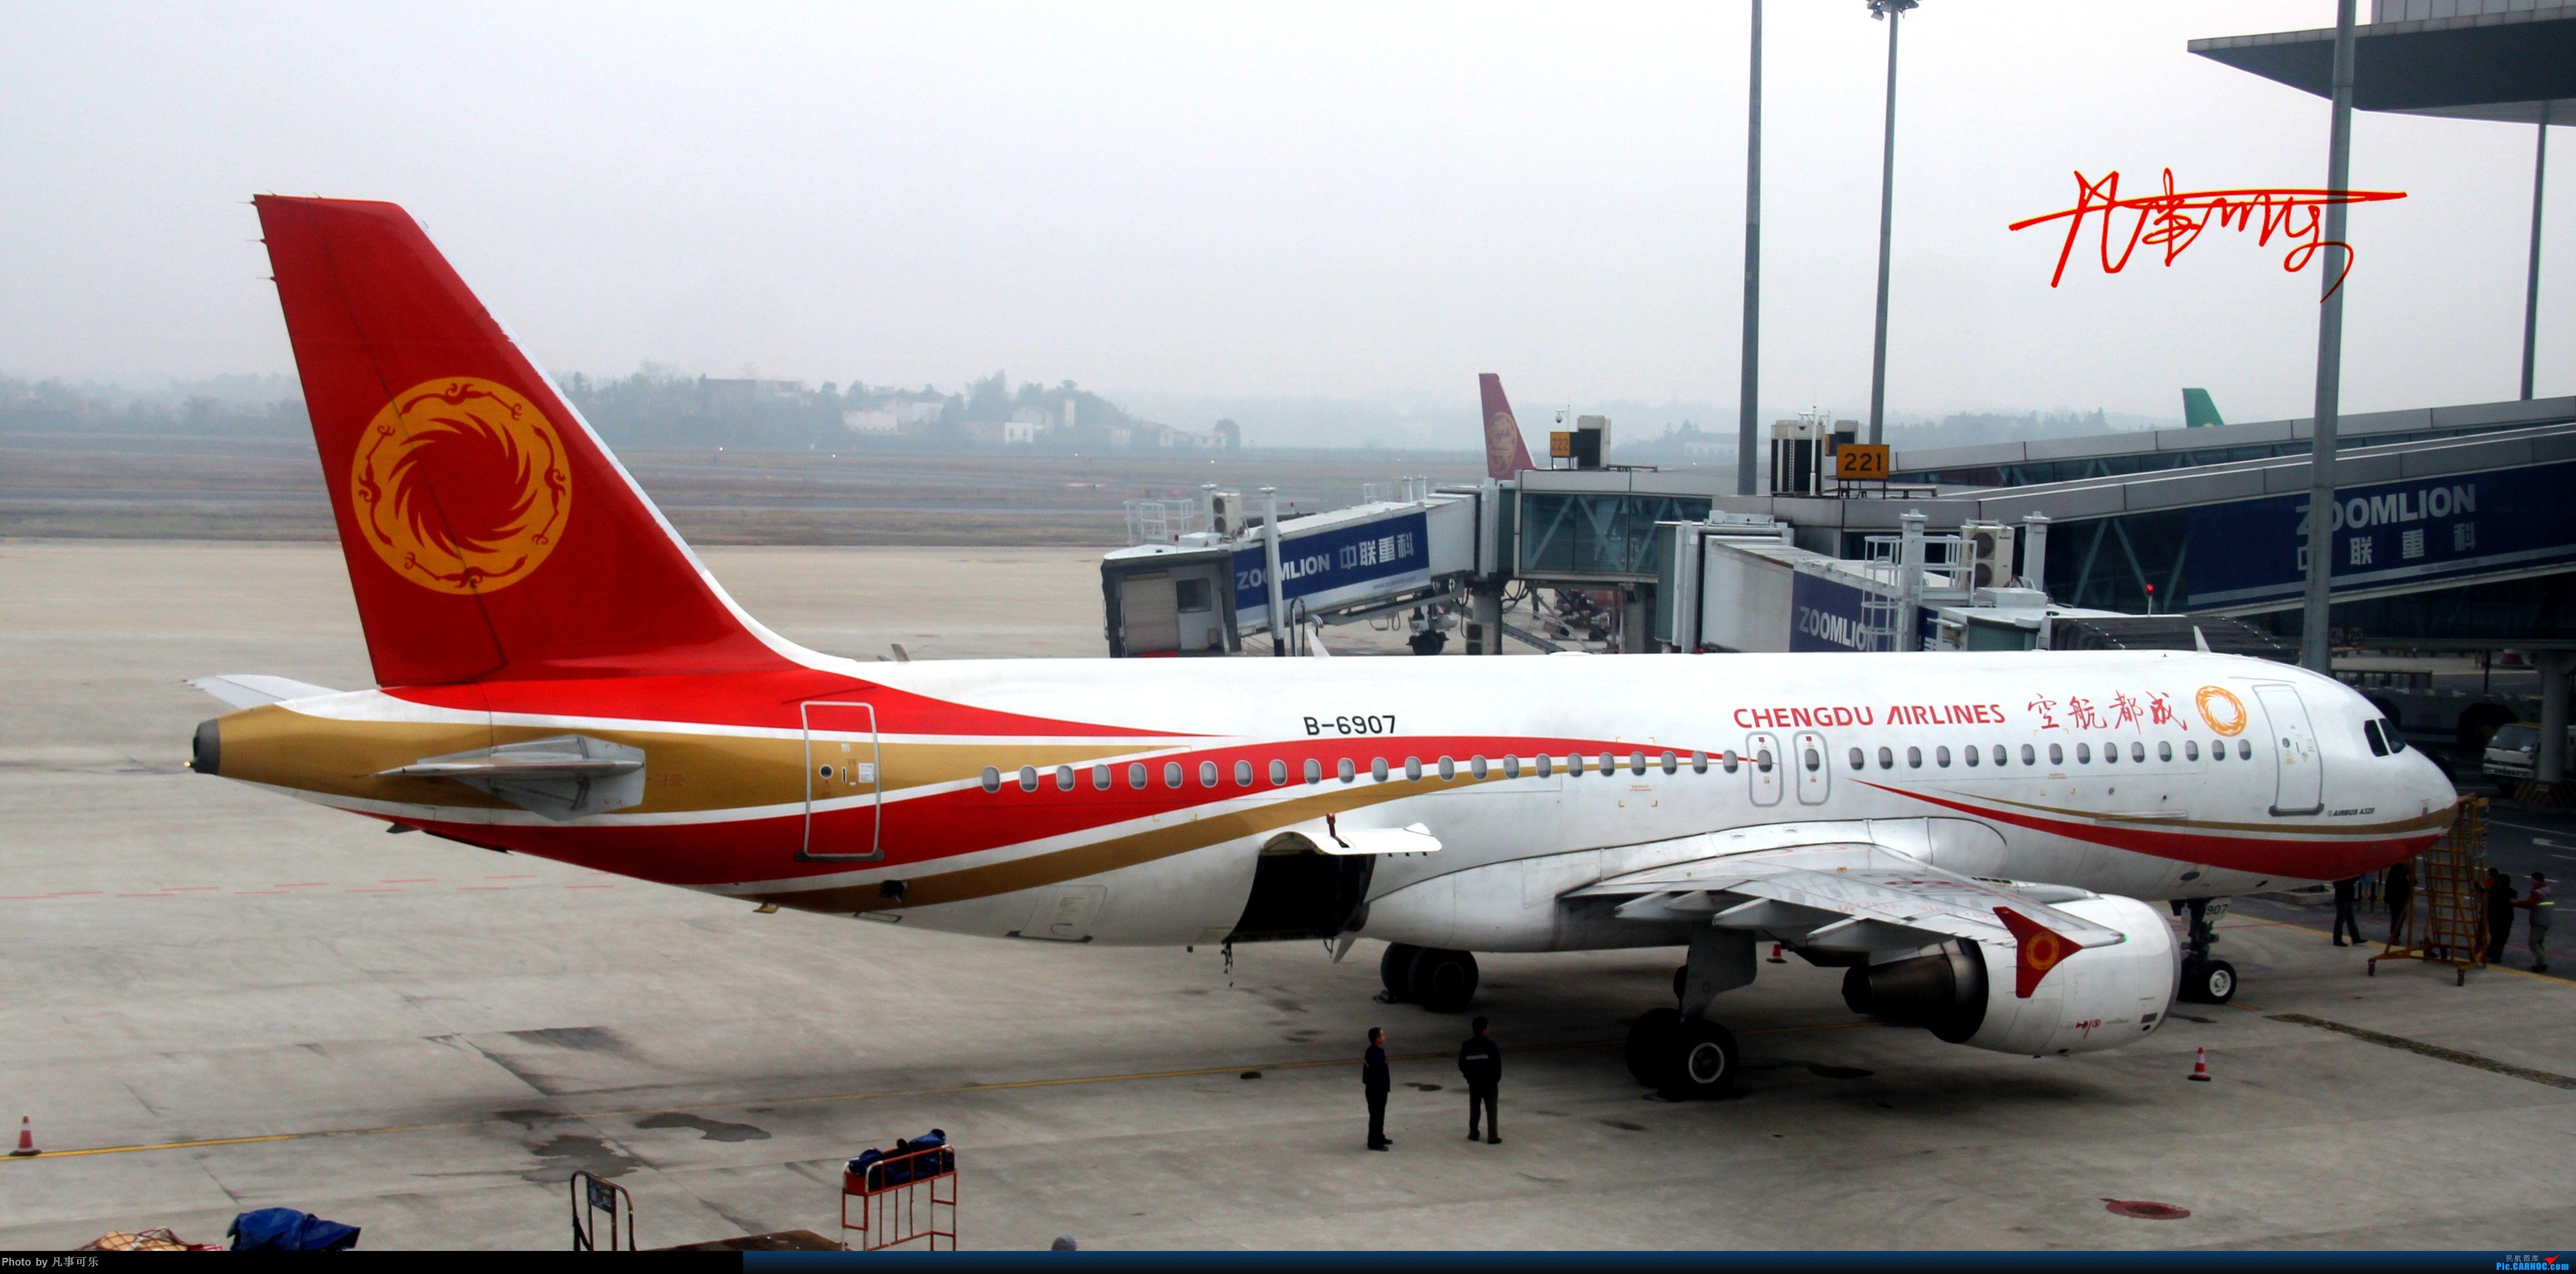 Re:[原创]这几年国内外拍的一些机 AIRBUS A320-200 B-6907 长沙黄花机场